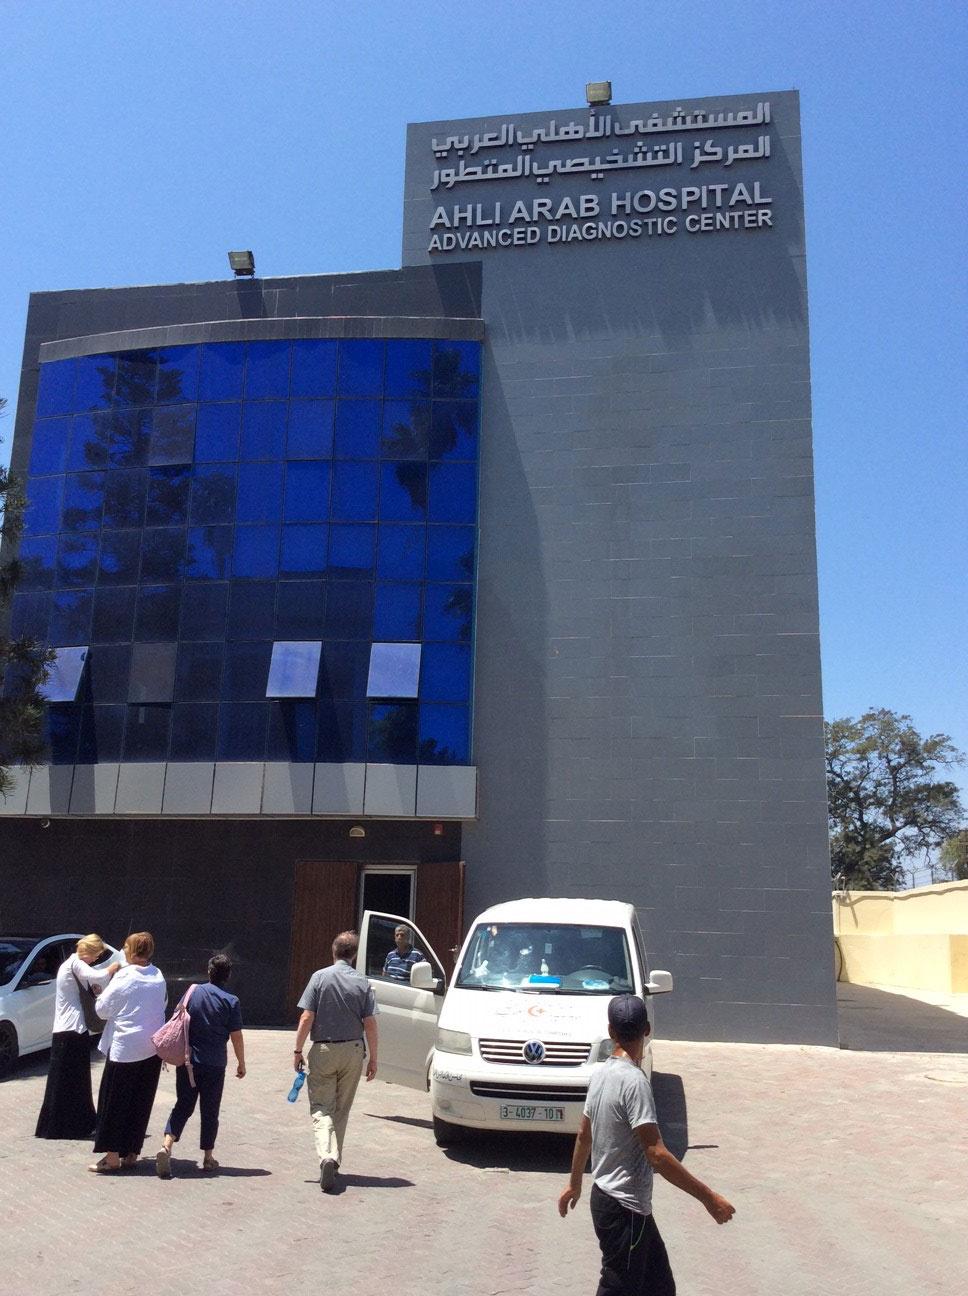 The Advanced Diagnostic Center at Ahli Arab Hospital, Gaza. Ahli Arab Hospital is the only Christian-run hospital in Gaza.